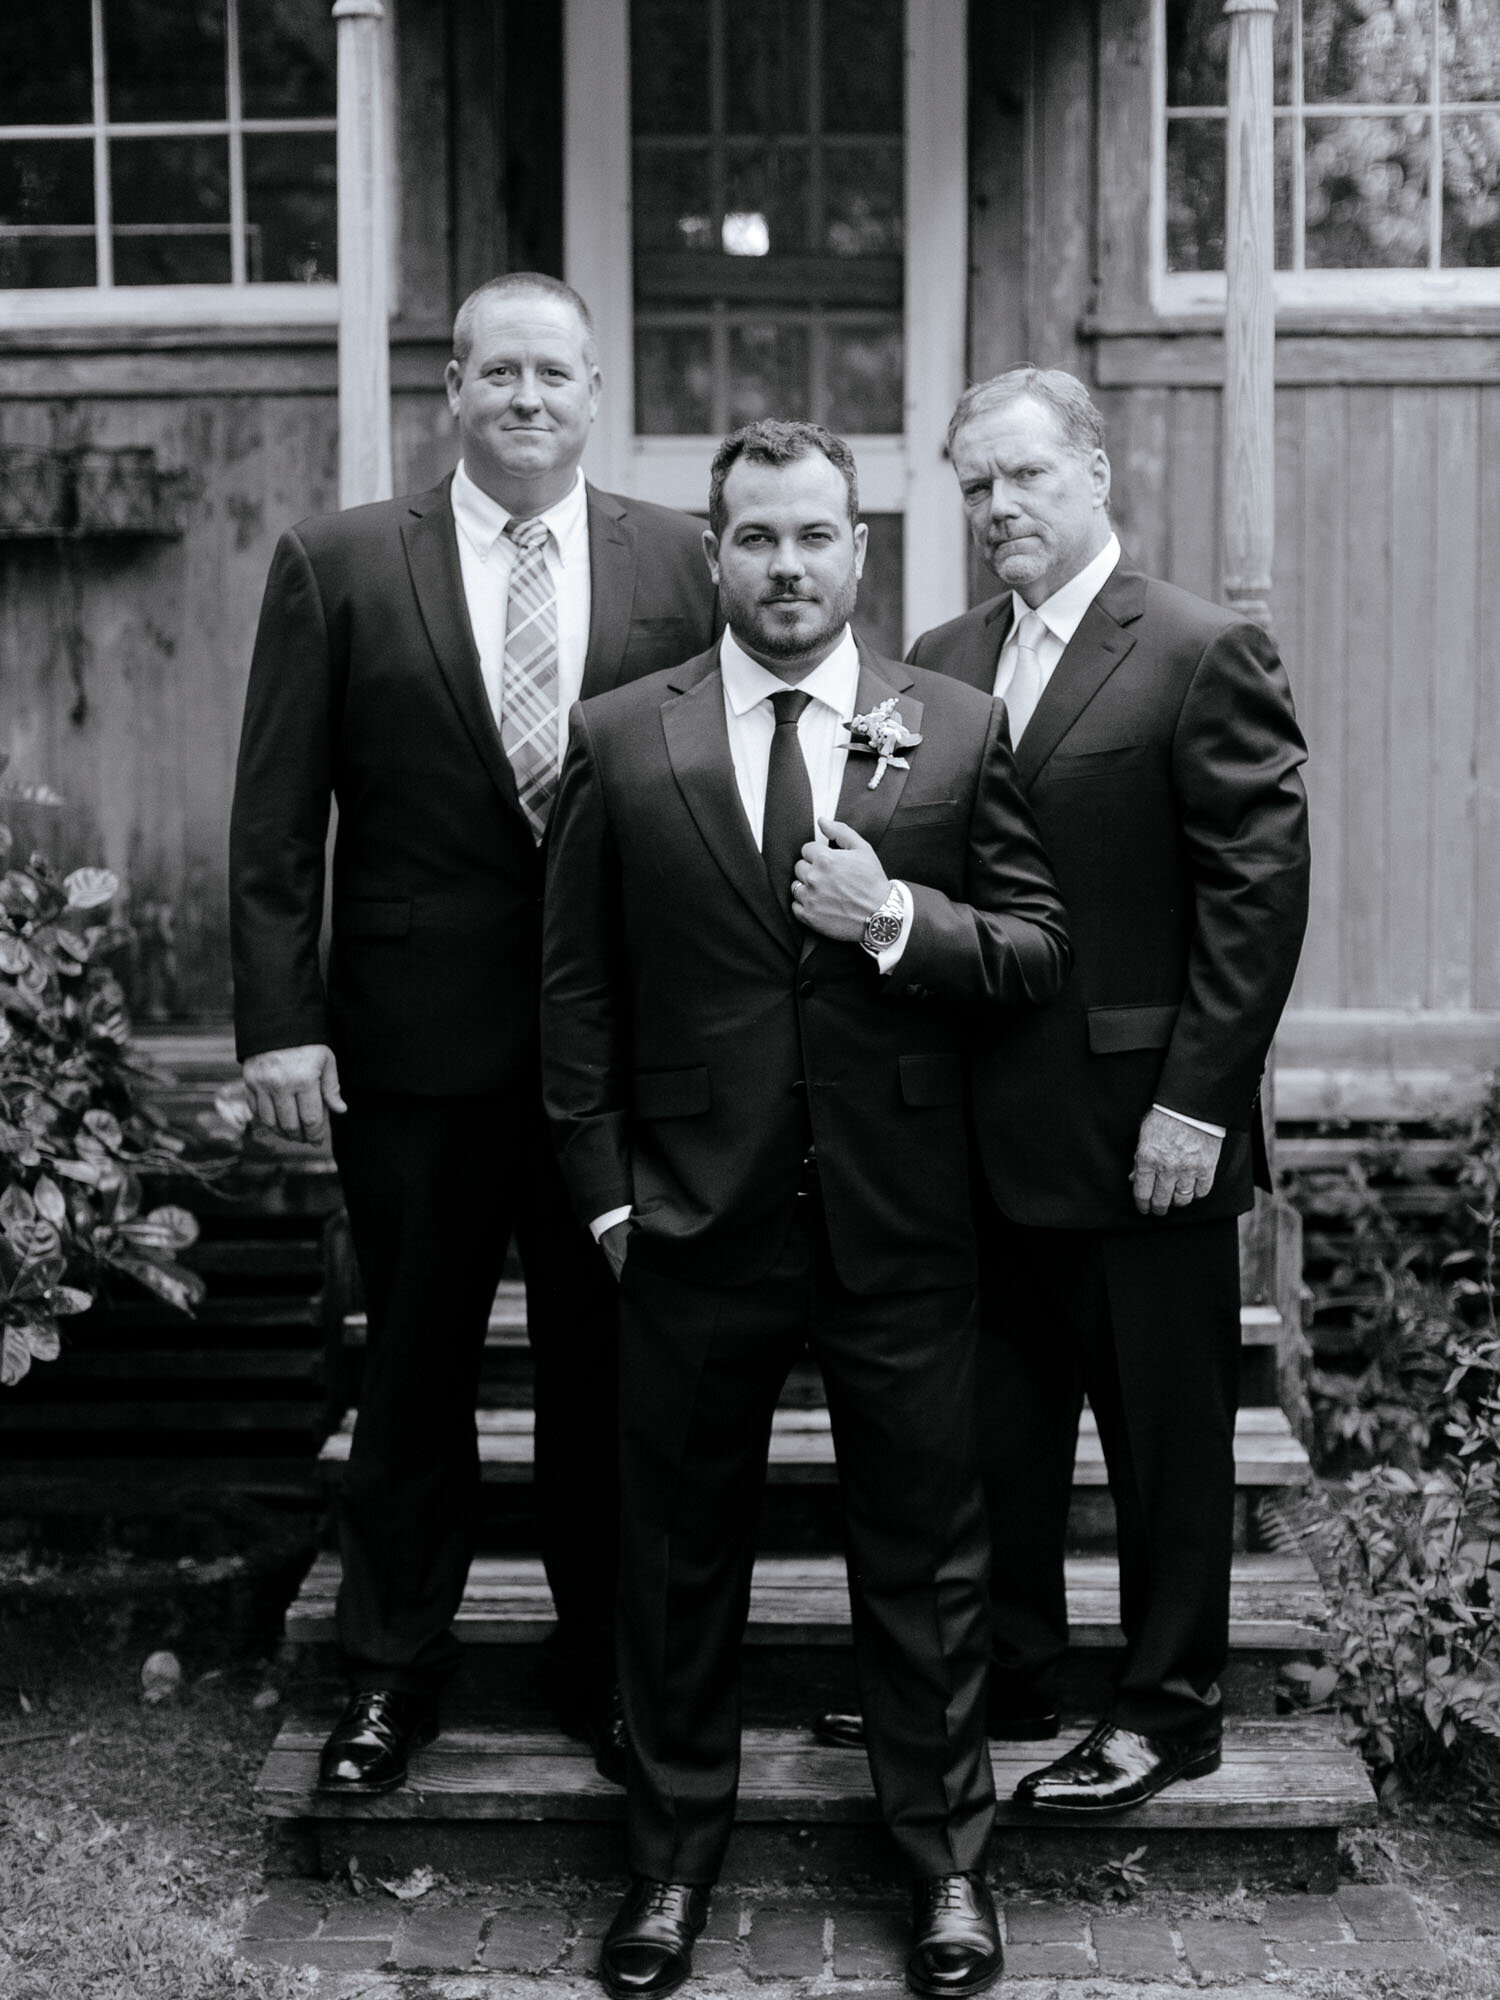 Chris-J-Evans-Maui-Wedding-Kim&Brian3233.jpg